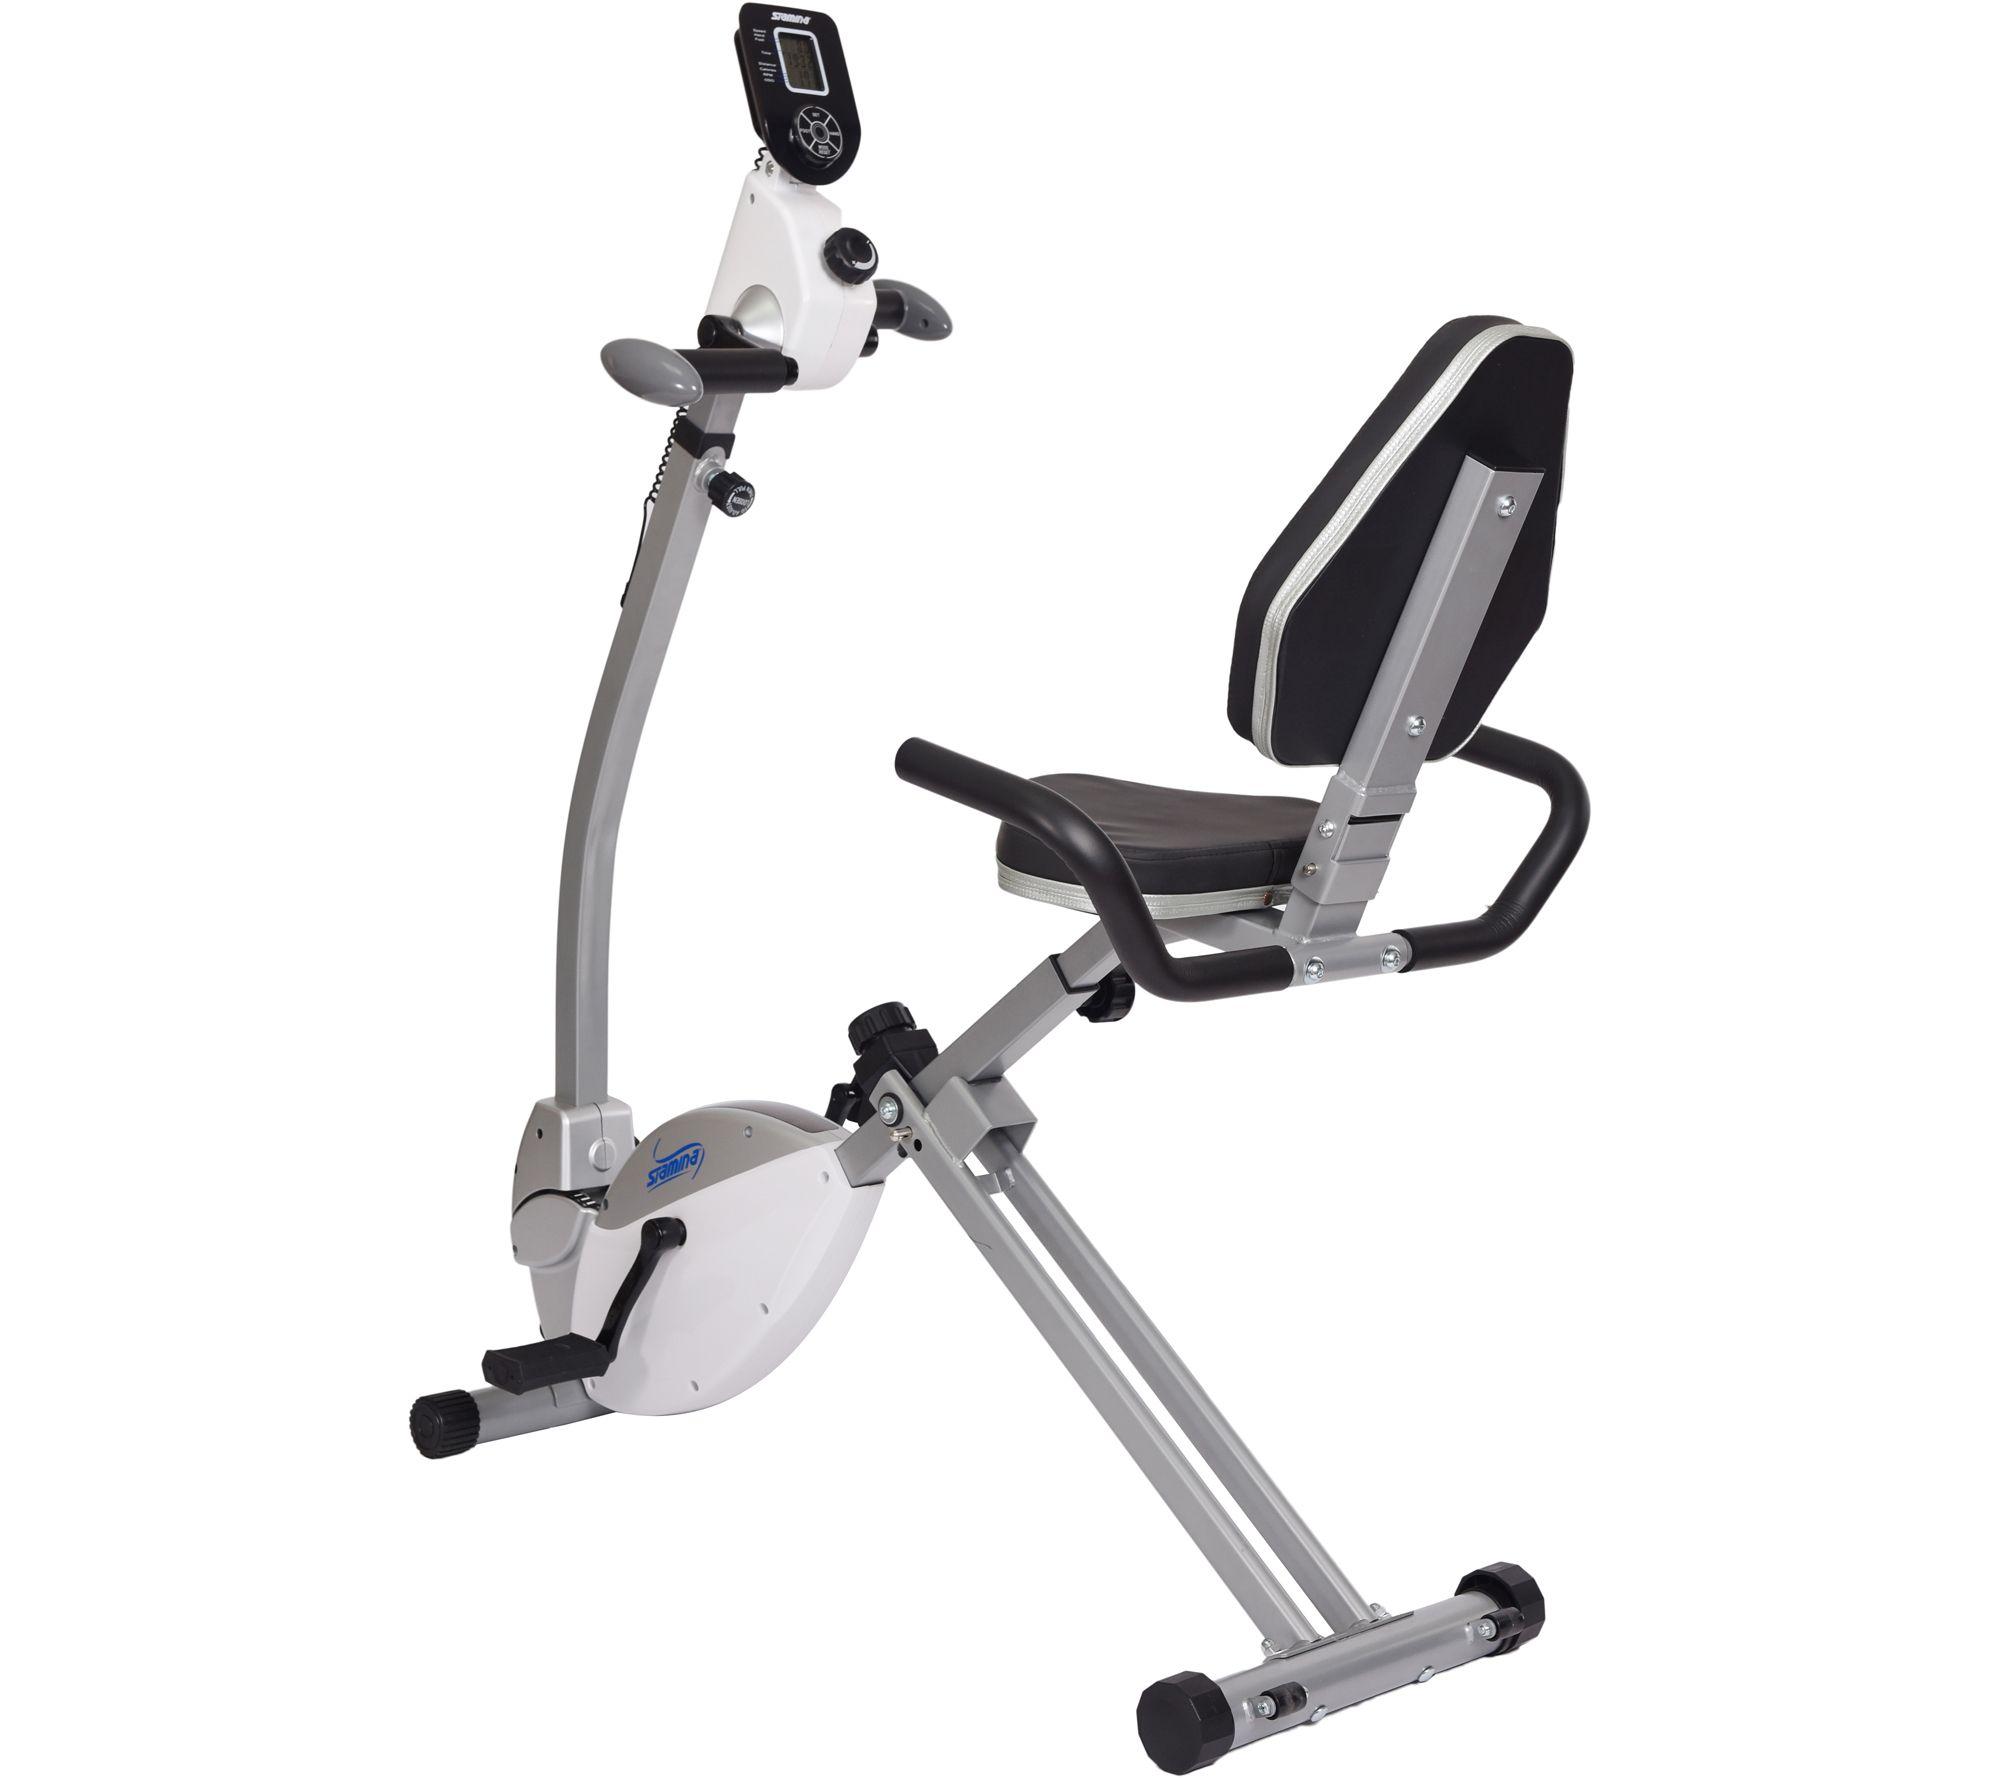 Stamina recumbent exercise bike with upper bodyexerciser